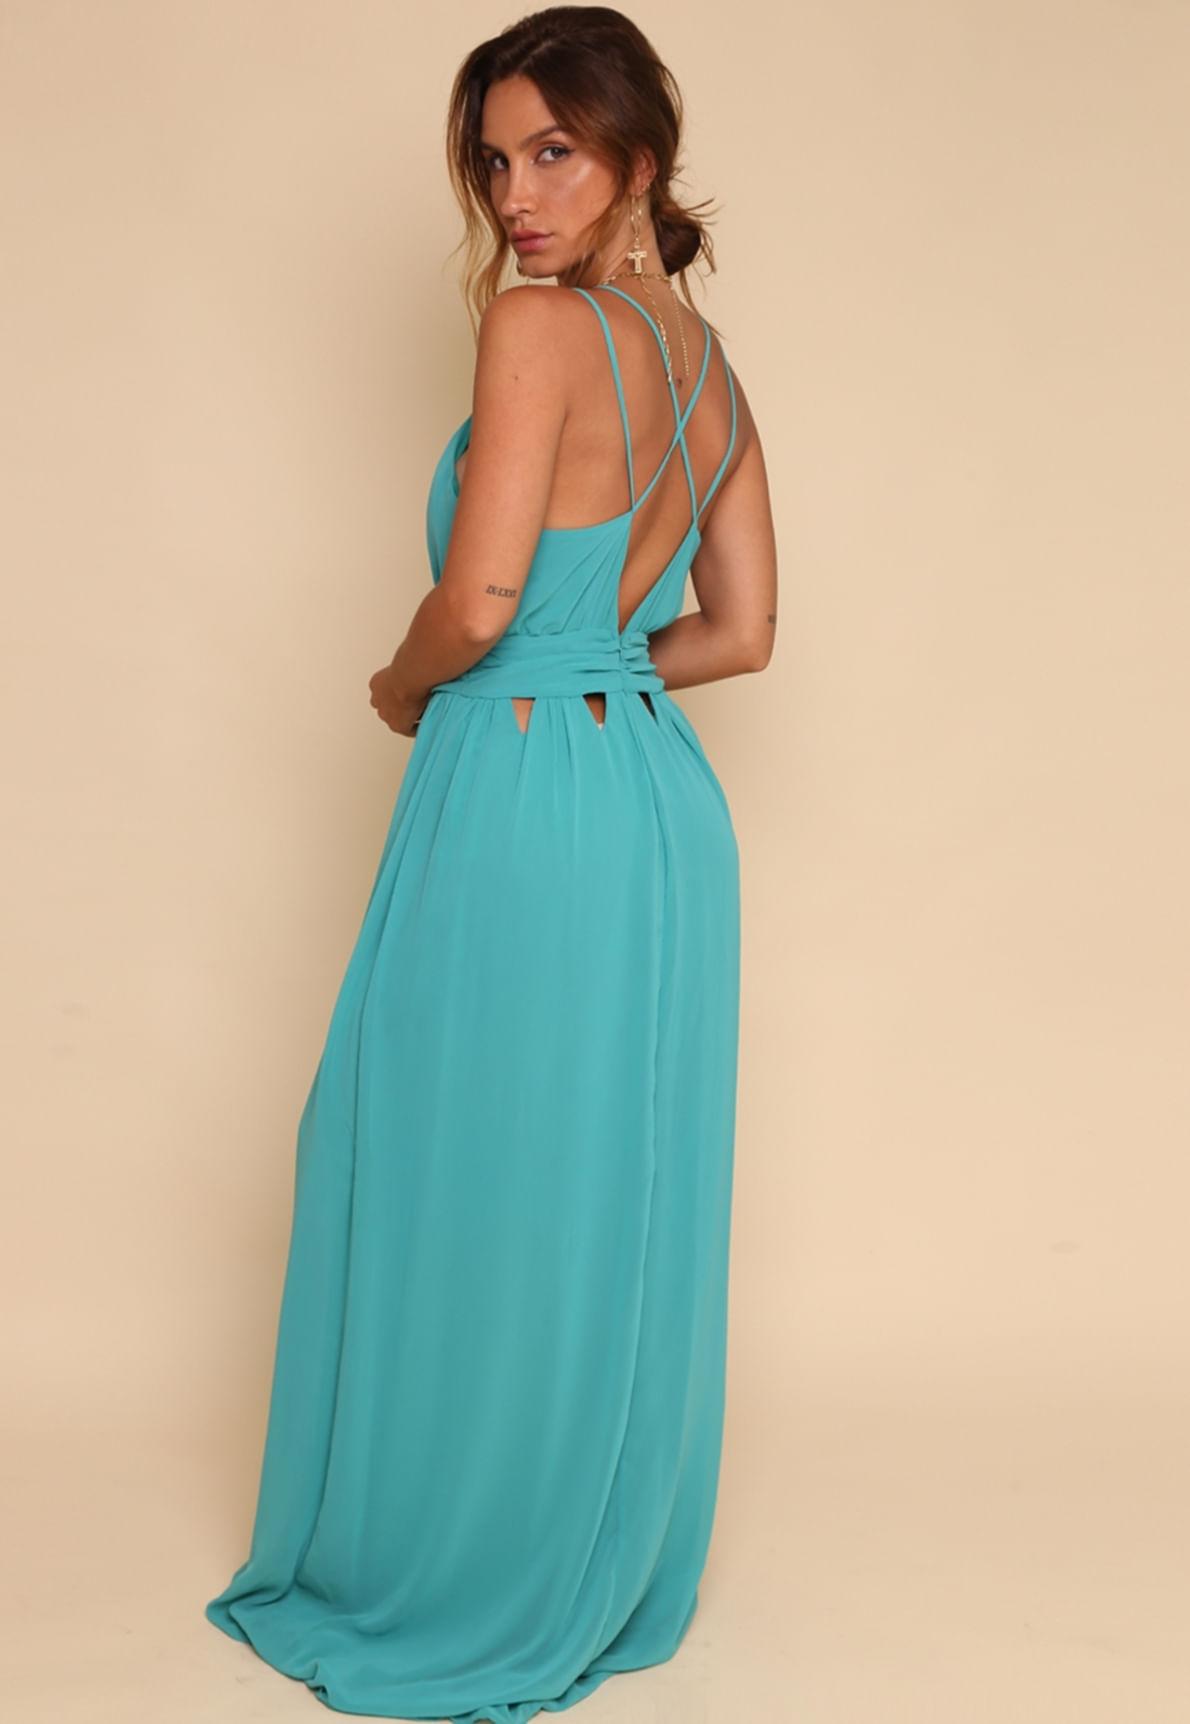 23218-vestido-longo-verde-agua-sandra-03